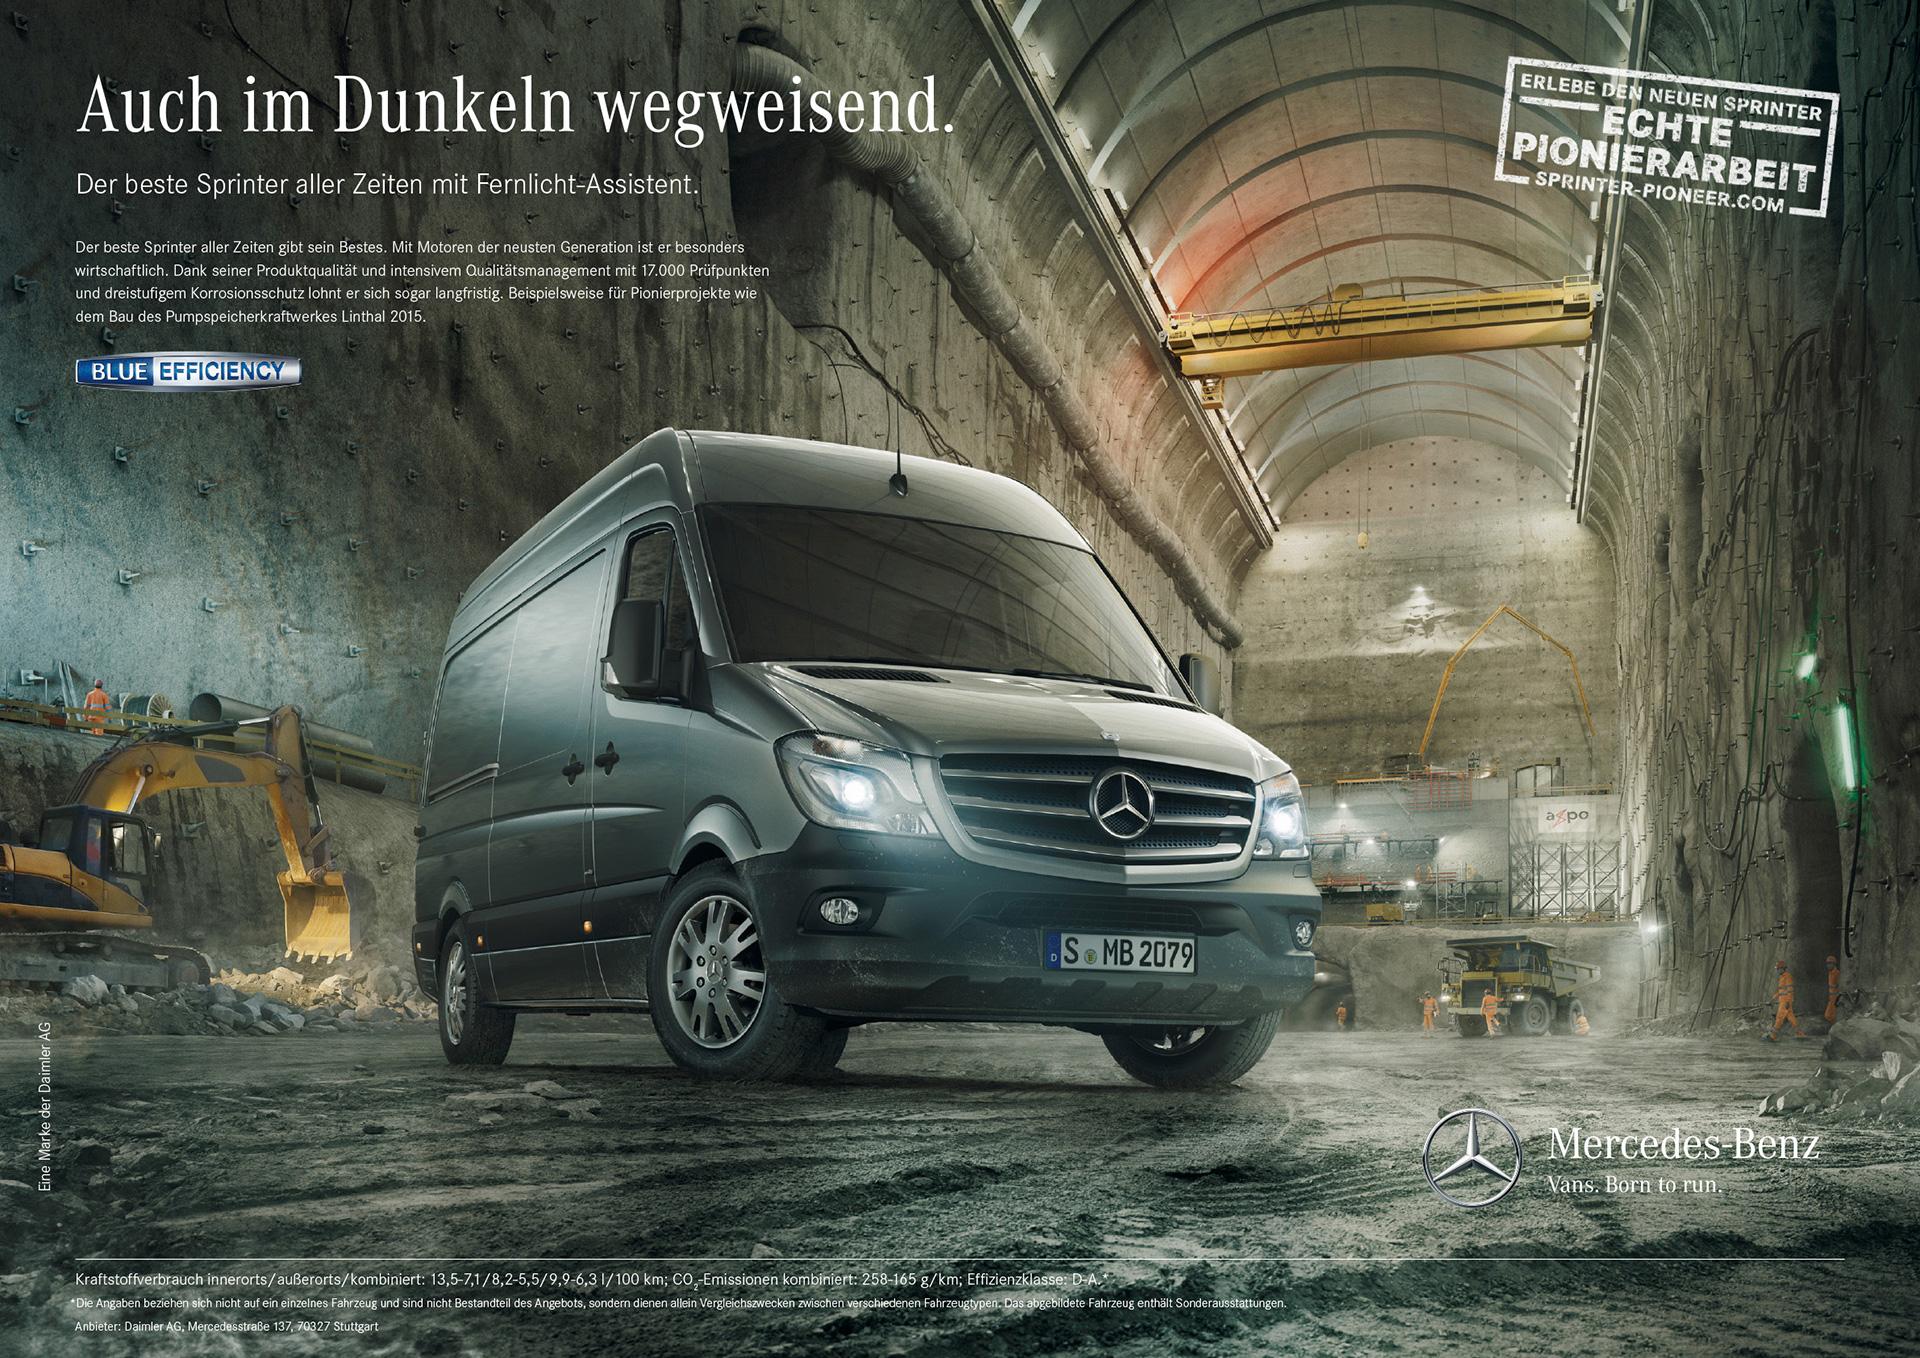 Kerstin_Correll_Mercedes-Benz_Sprinter_Pioneer_03